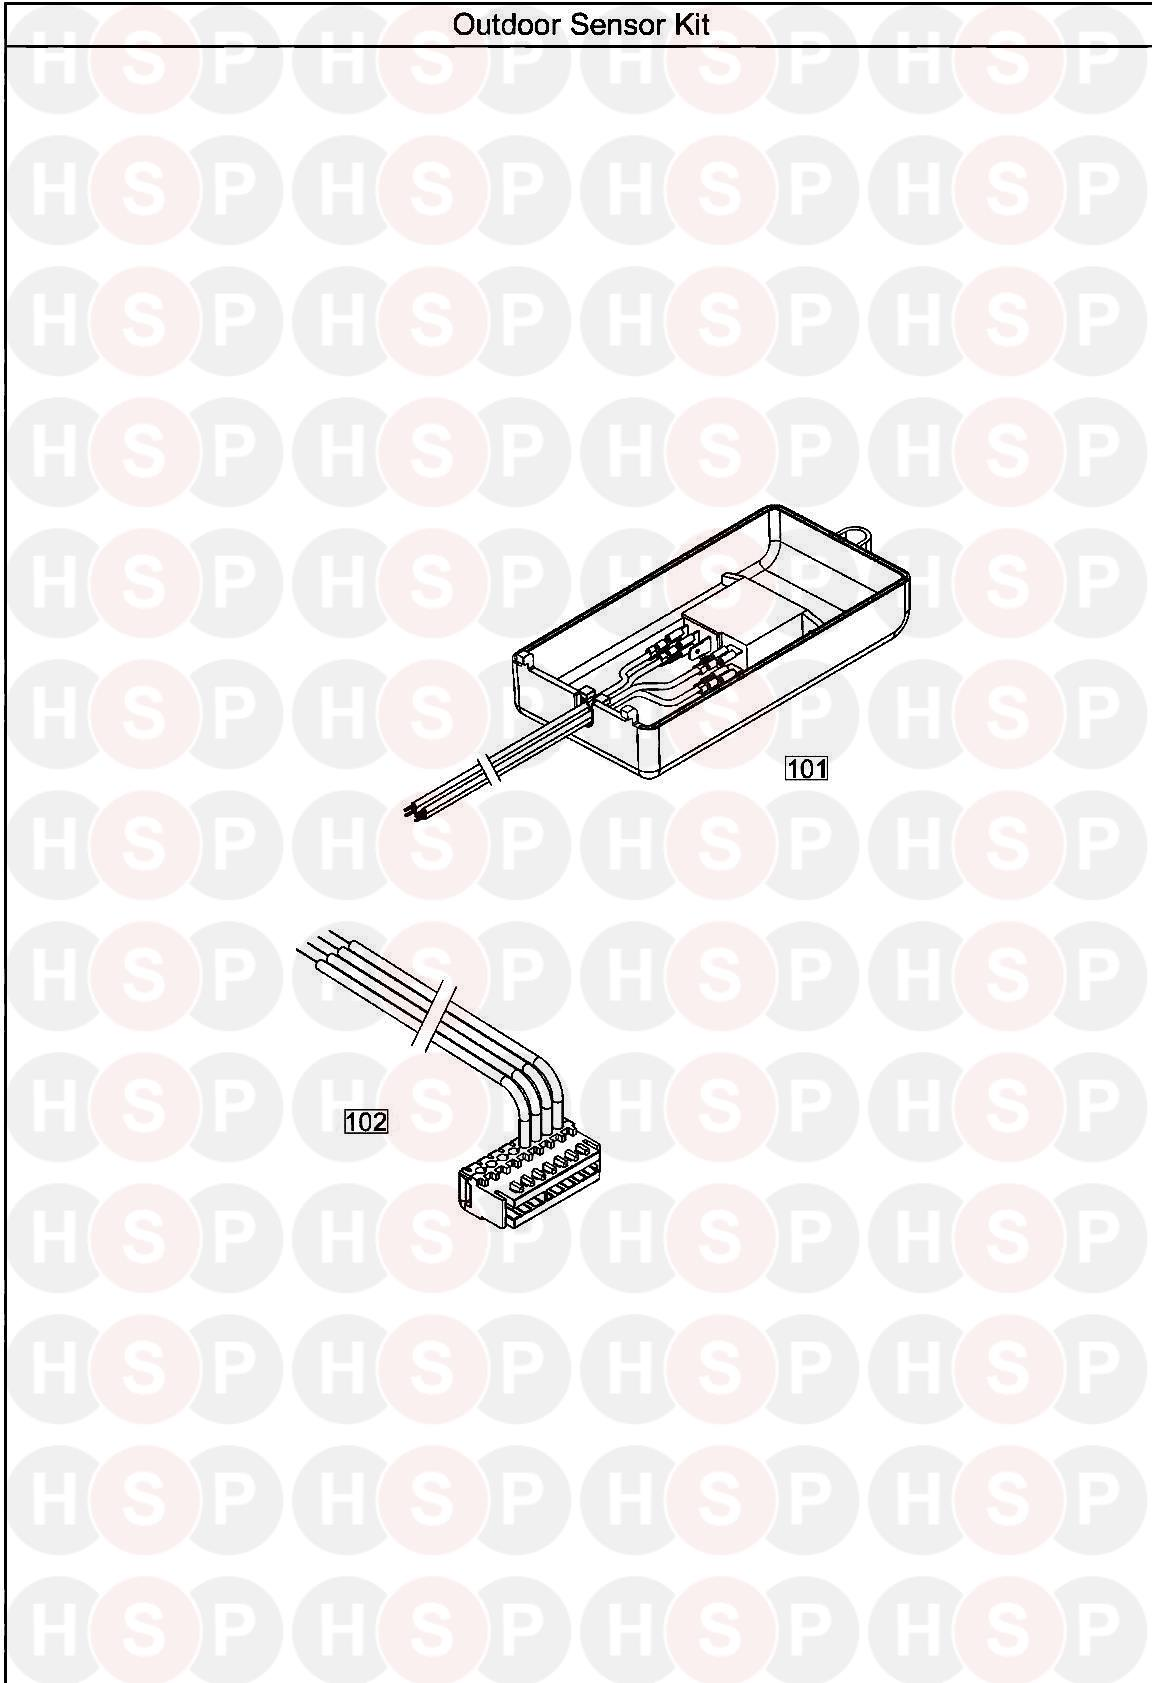 baxi megaflo 2 system 18 compact ga  outdoor sensor